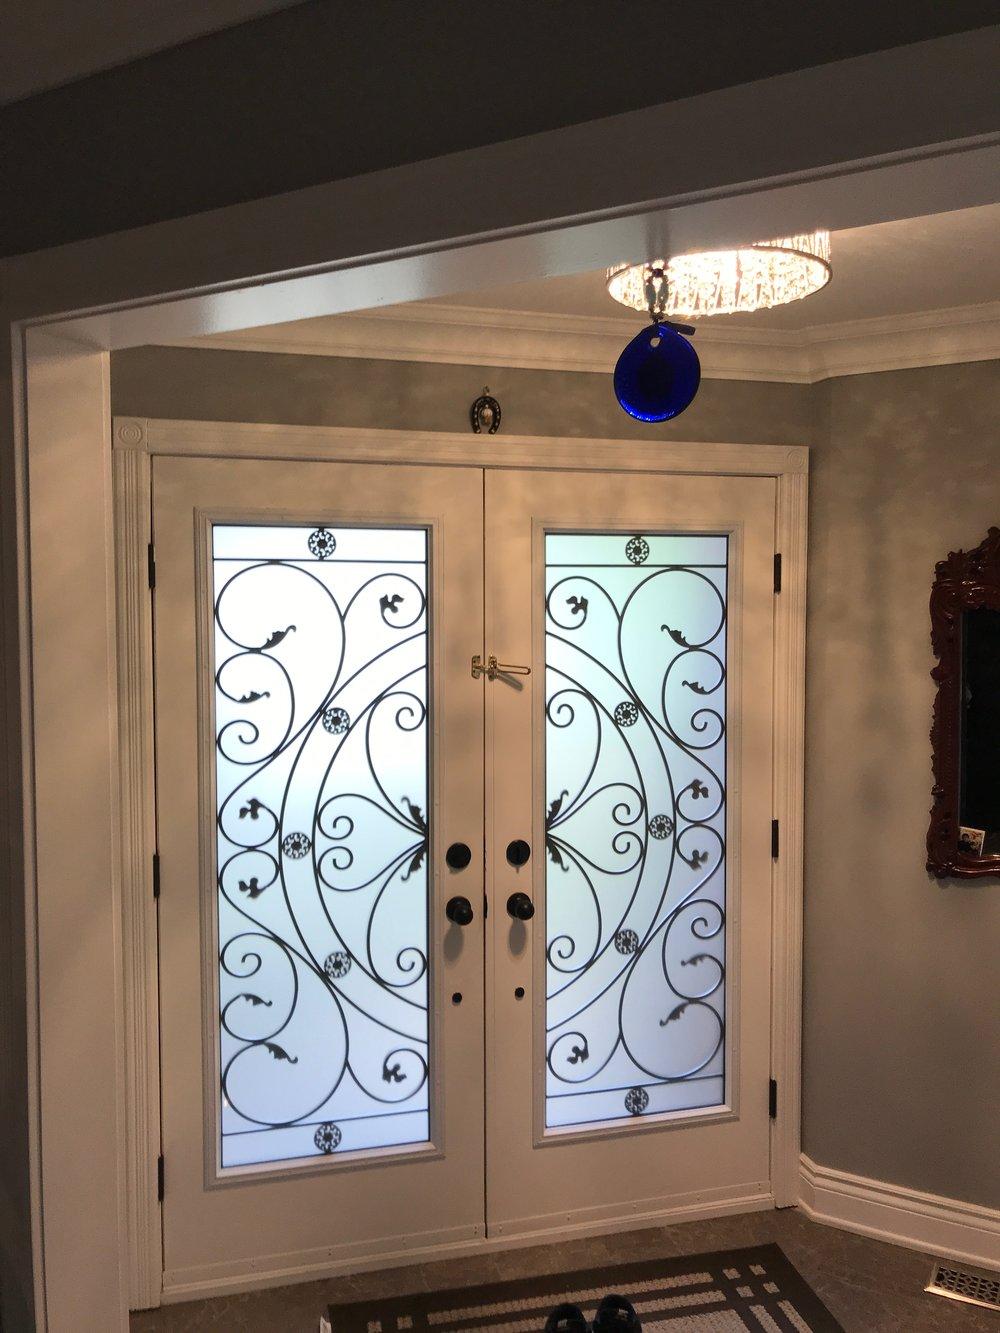 Campbellsford-Wrought-Iron-Glass-Door-Inserts-Newmarket-Ontario